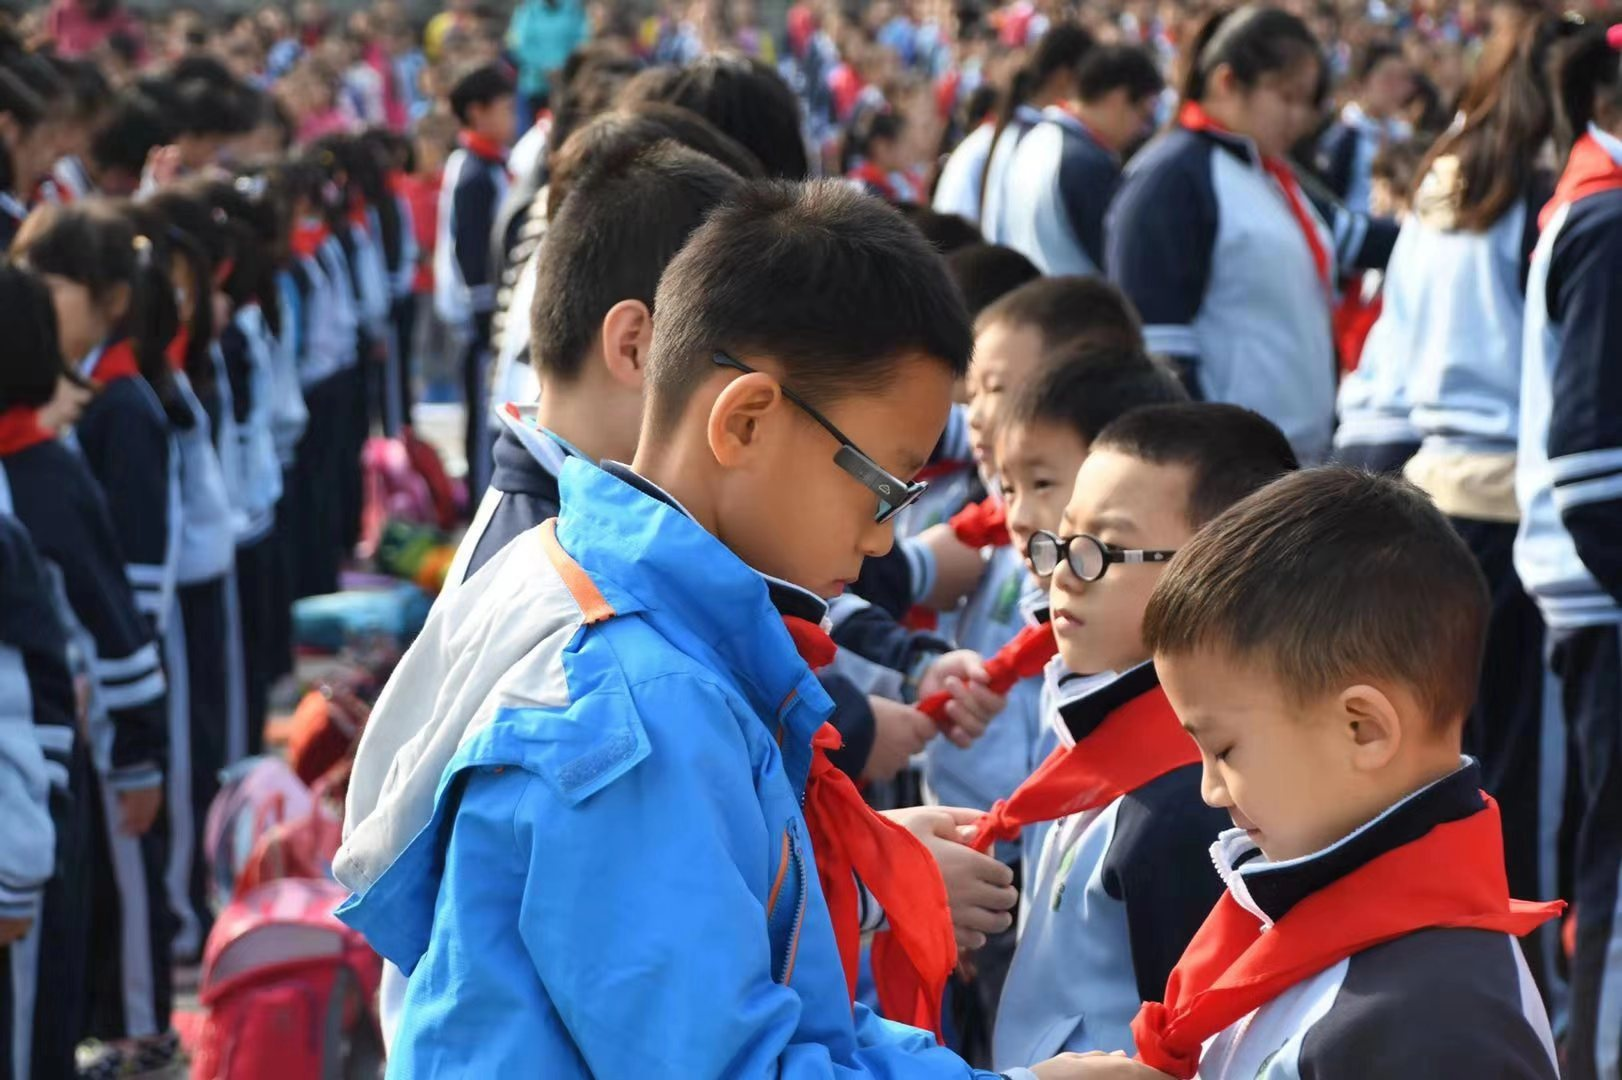 http://www.jywjkt.com/shehuiwanxiang/284897.html